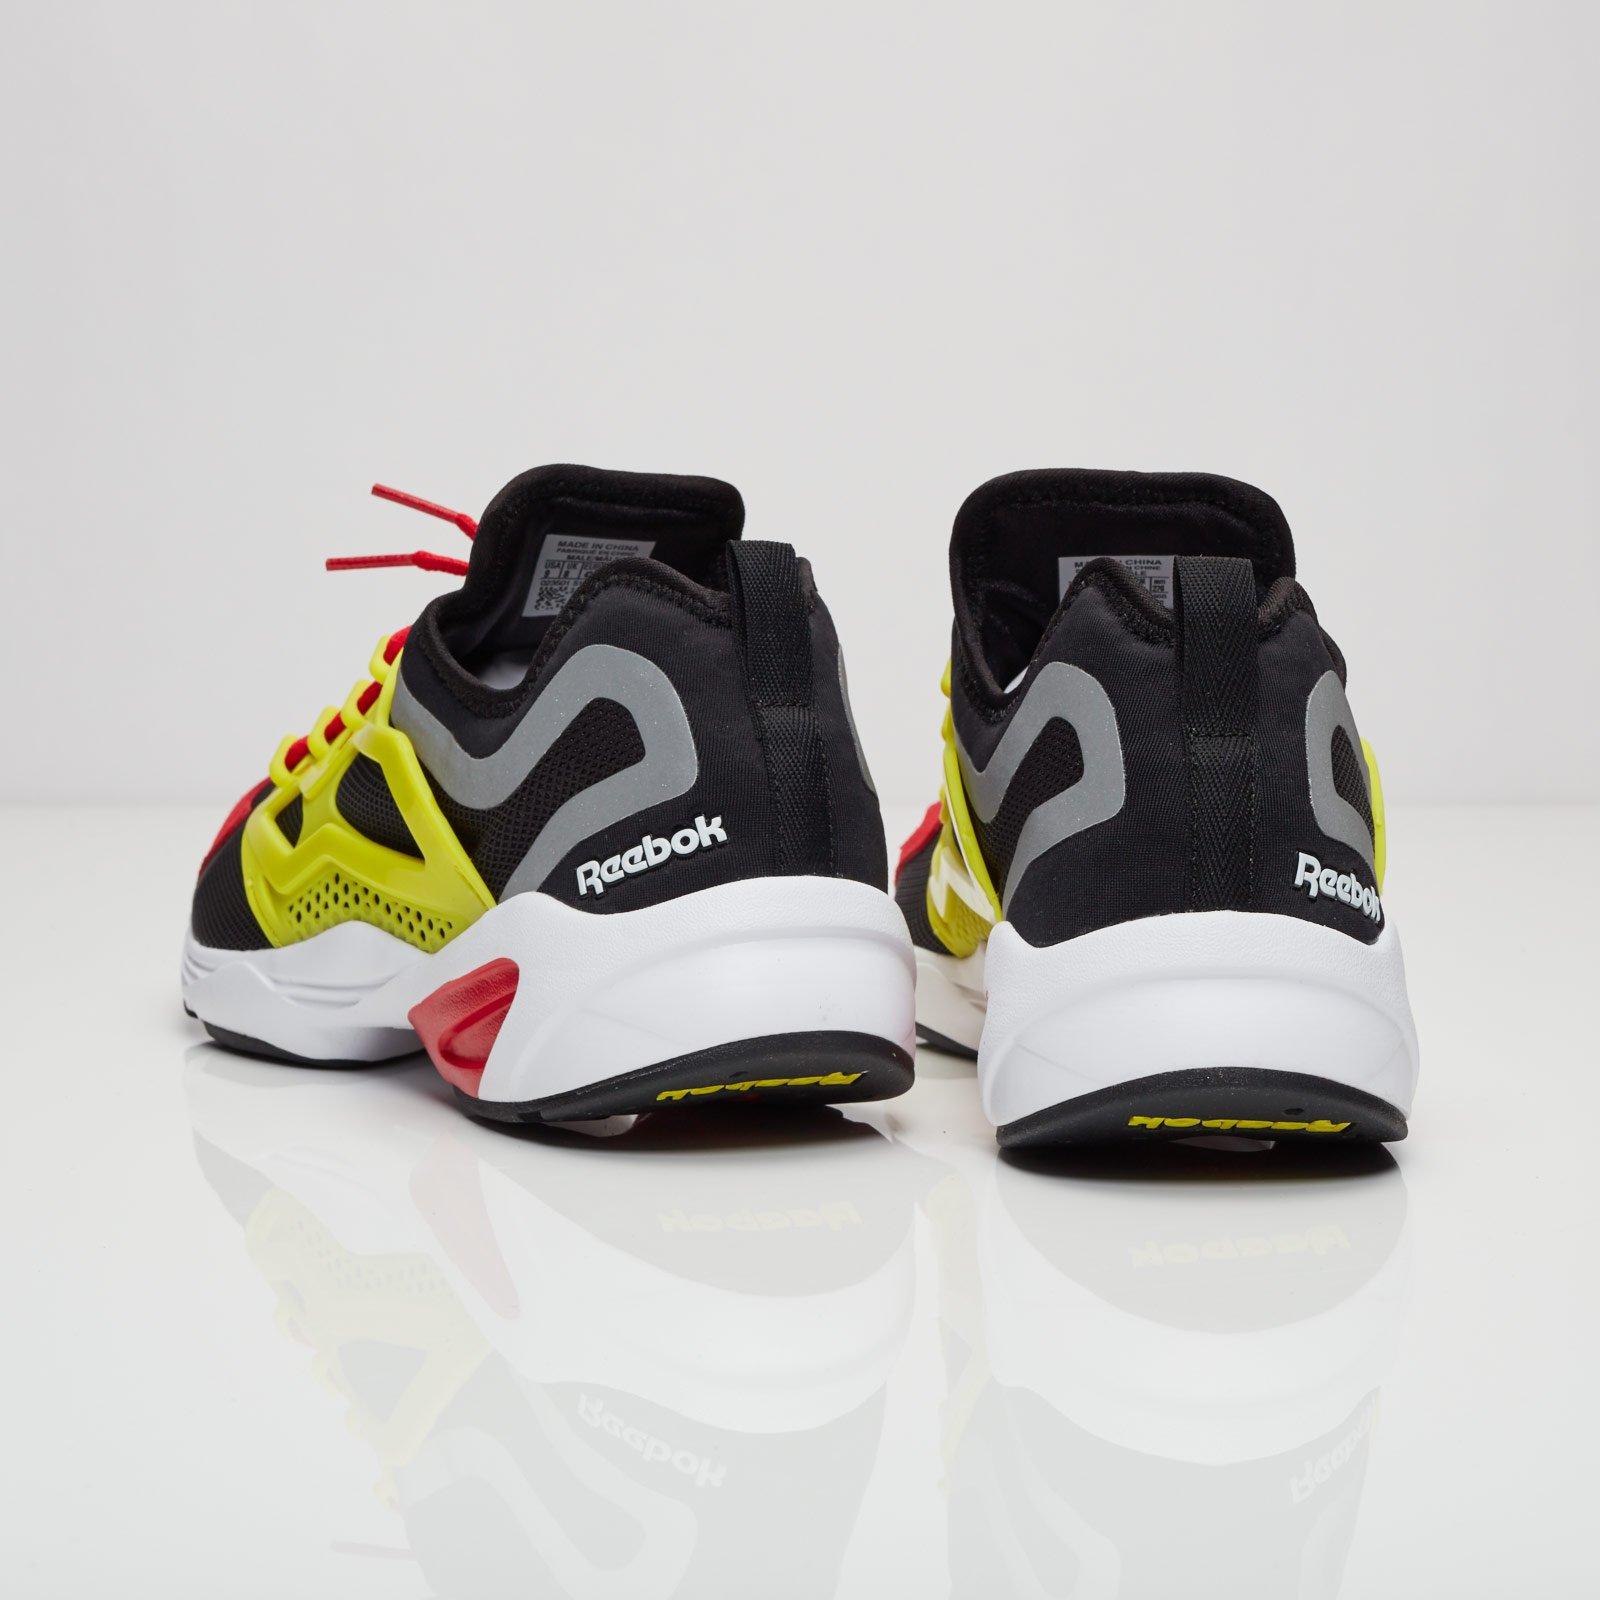 Reebok Fury Adapt - Ar1868 - Sneakersnstuff  40705a7b3